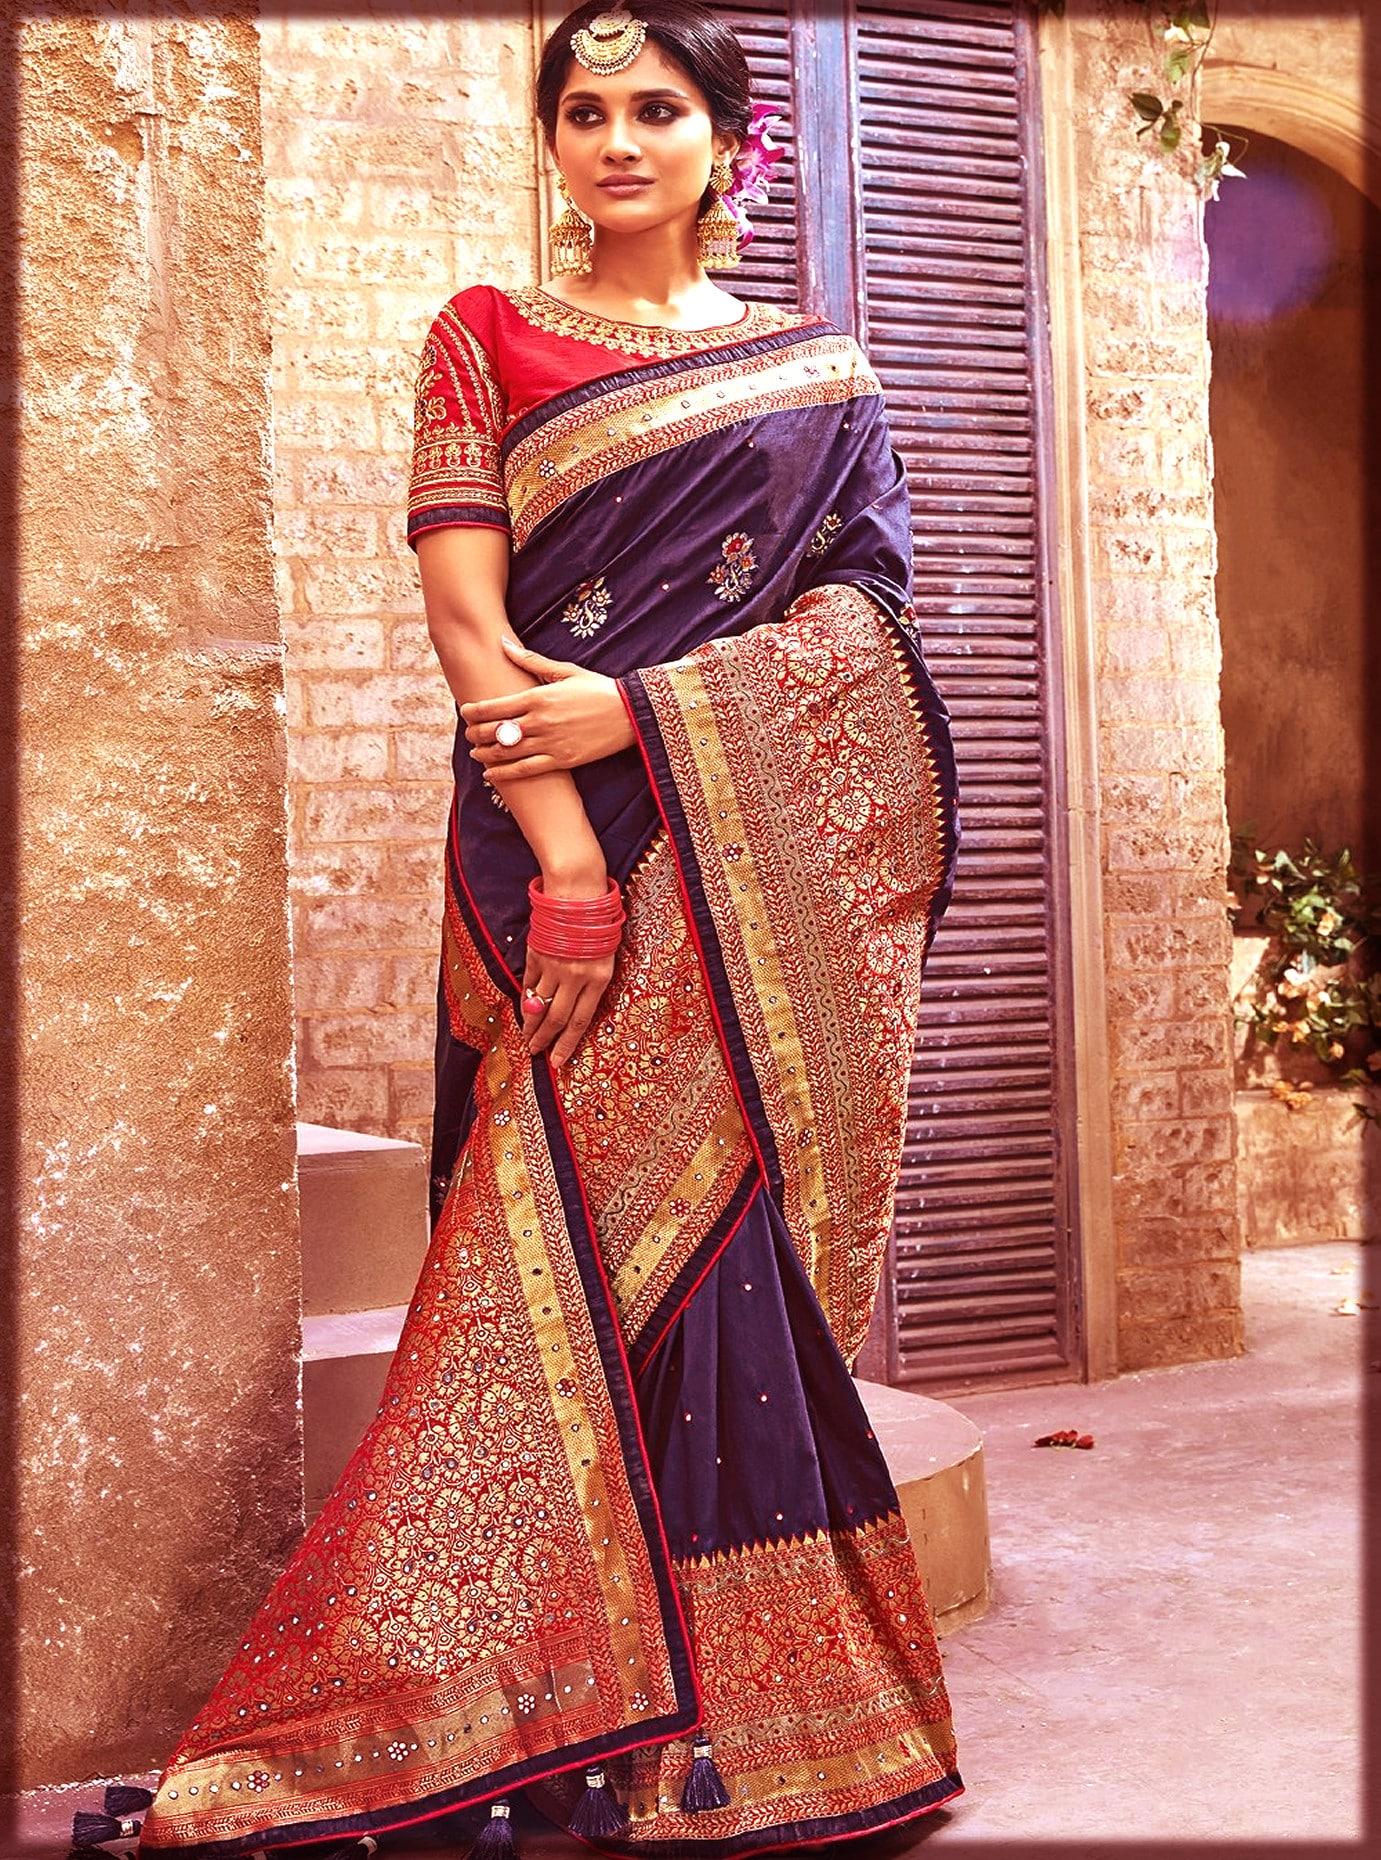 banarsi Indian Bridal sari